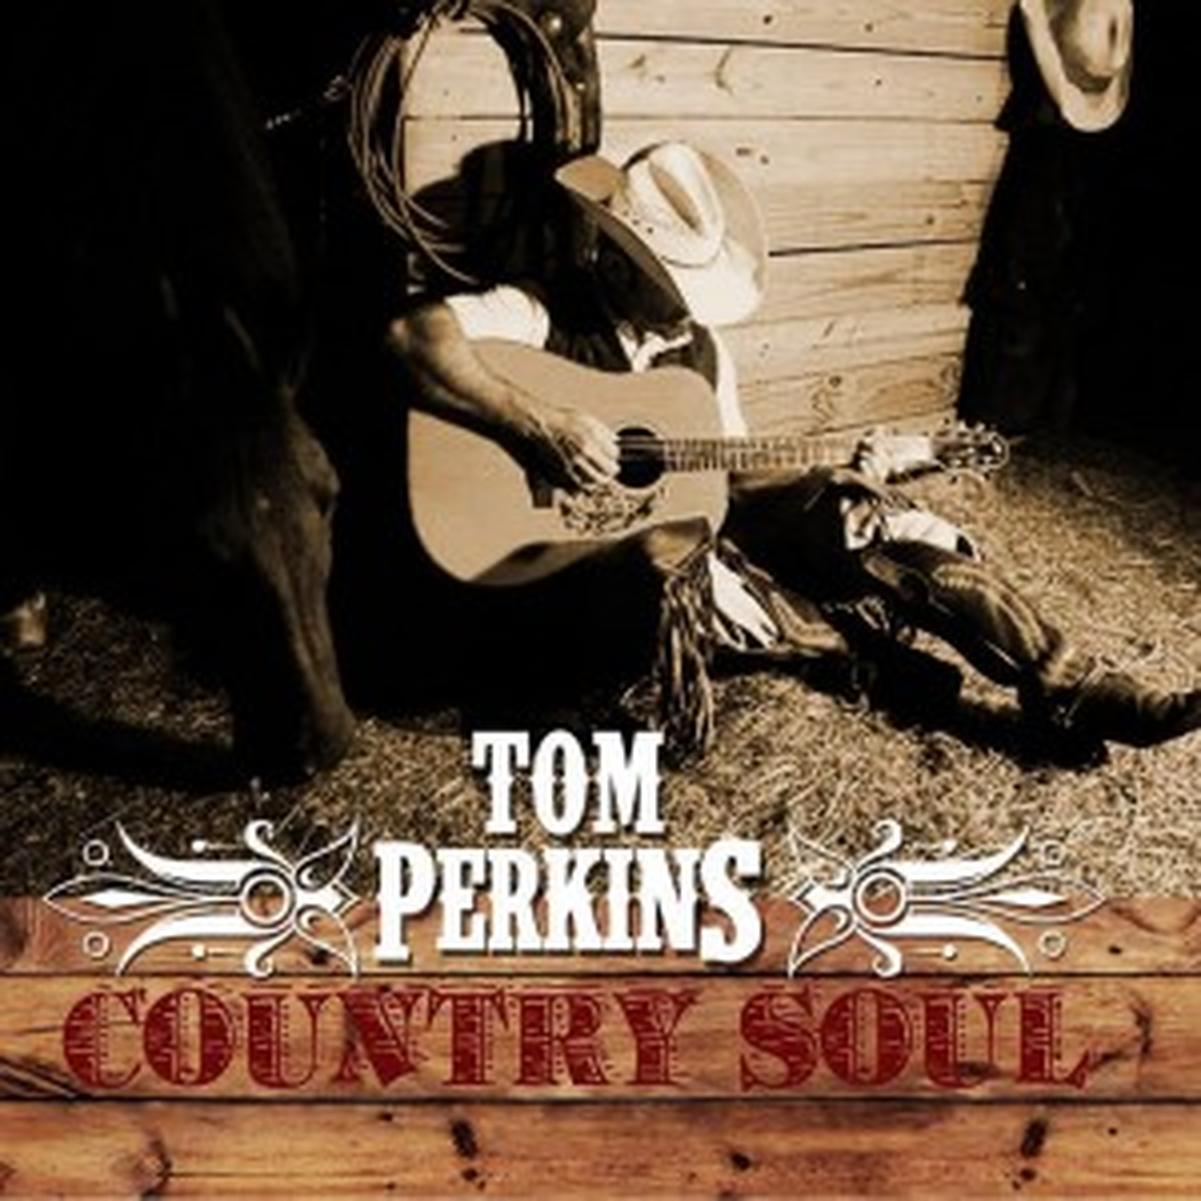 Tom Perkins